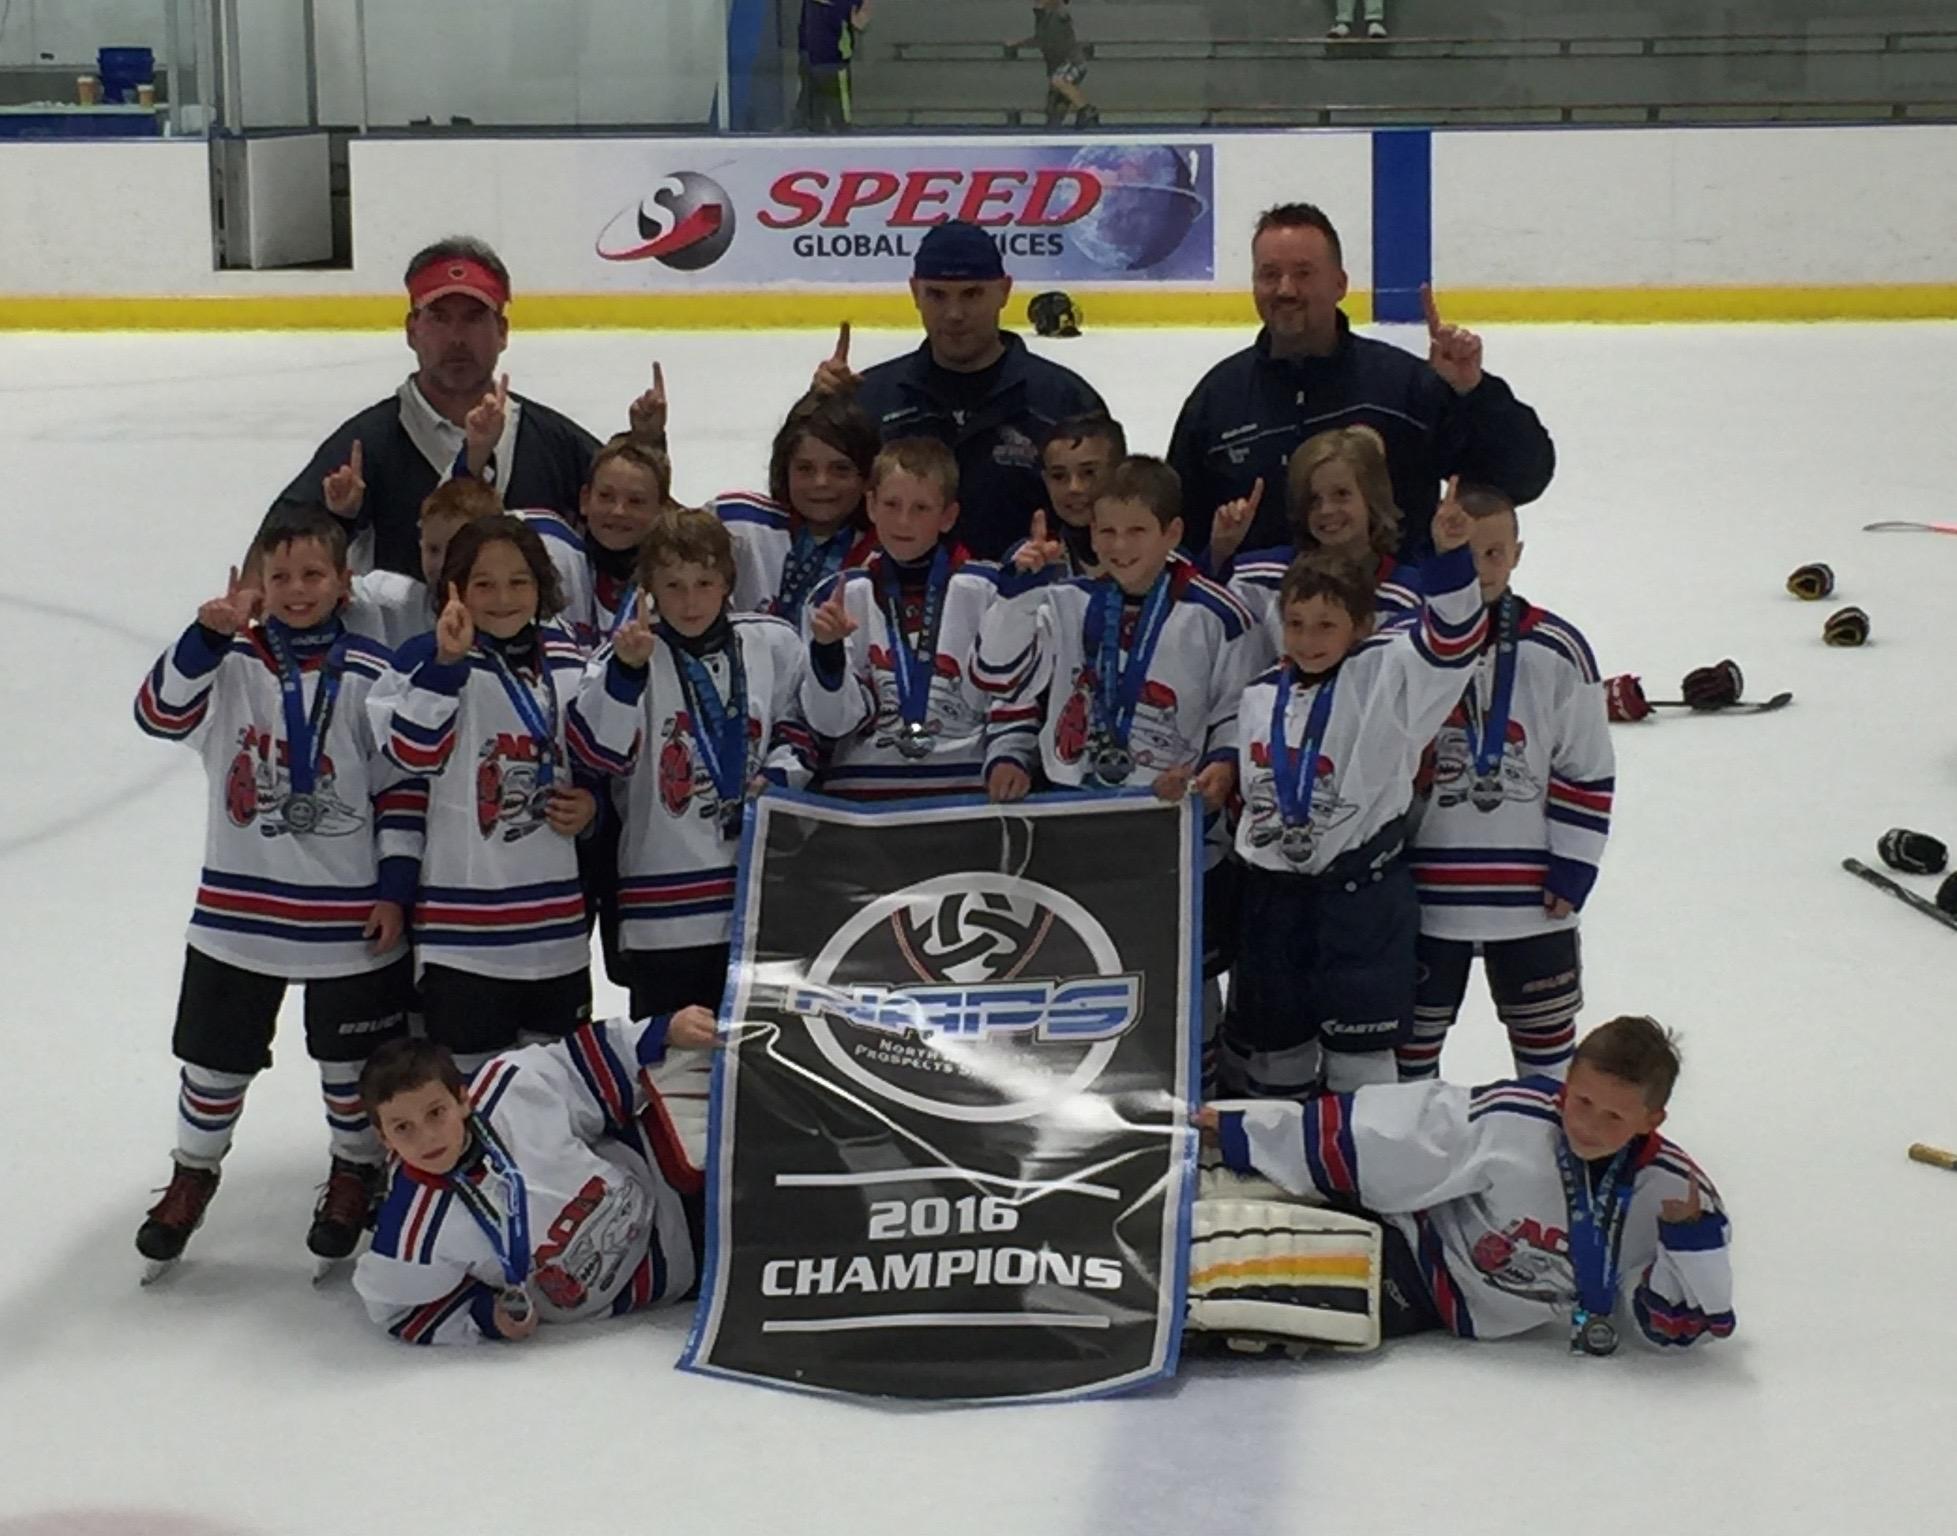 07 Aces Win Naps Buffalo 2016 U S Aces Hockey Club